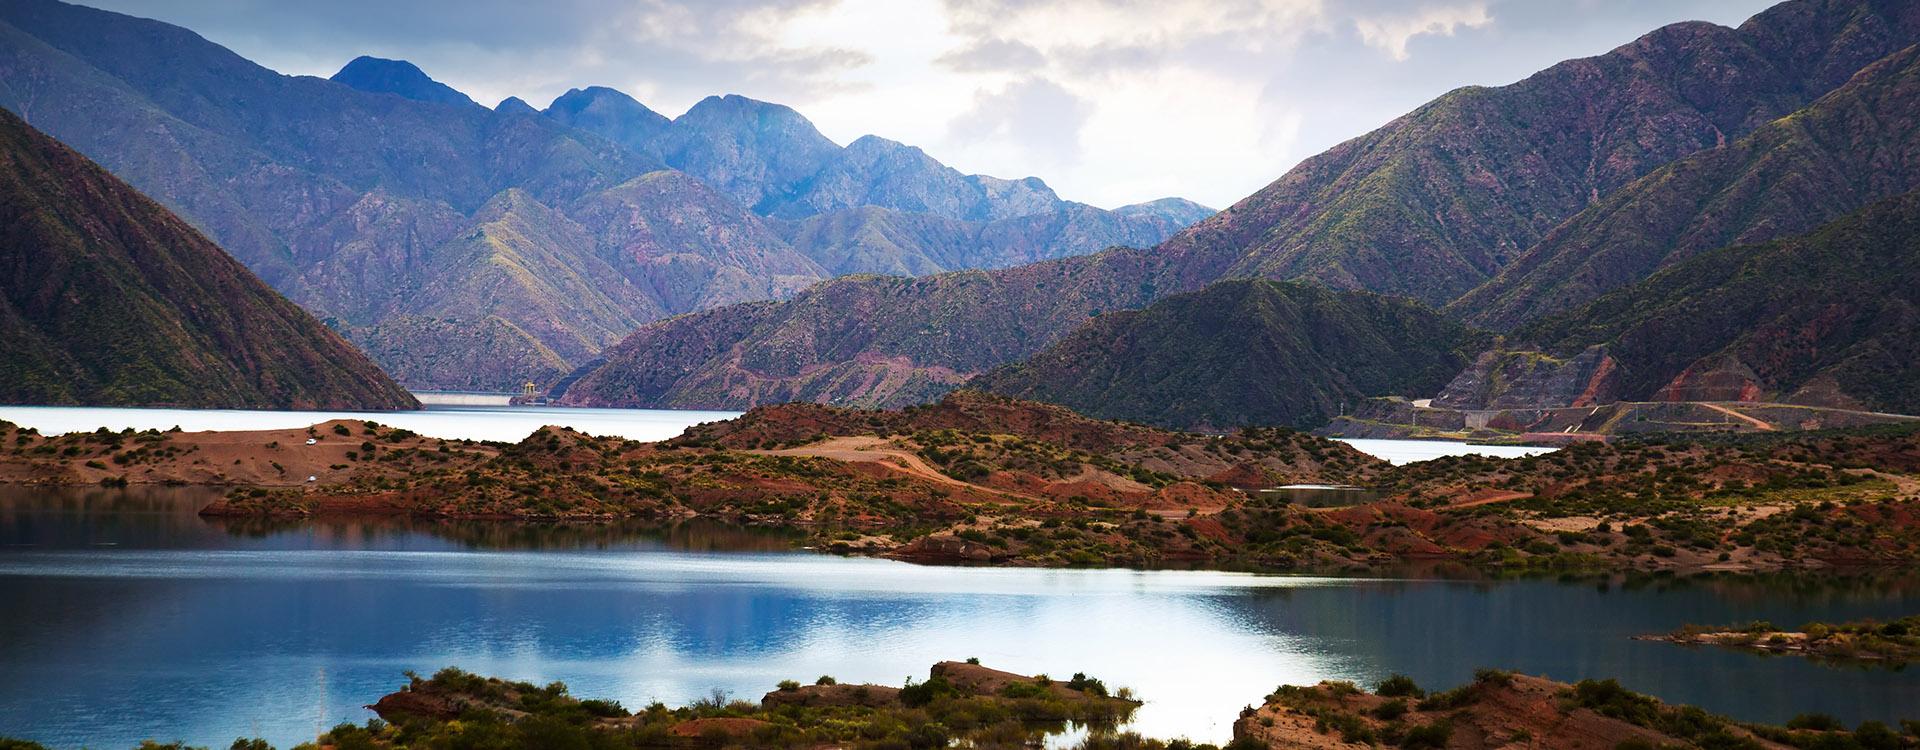 View of lake in district Potrerillos of Mendoza province, Argentina, South America